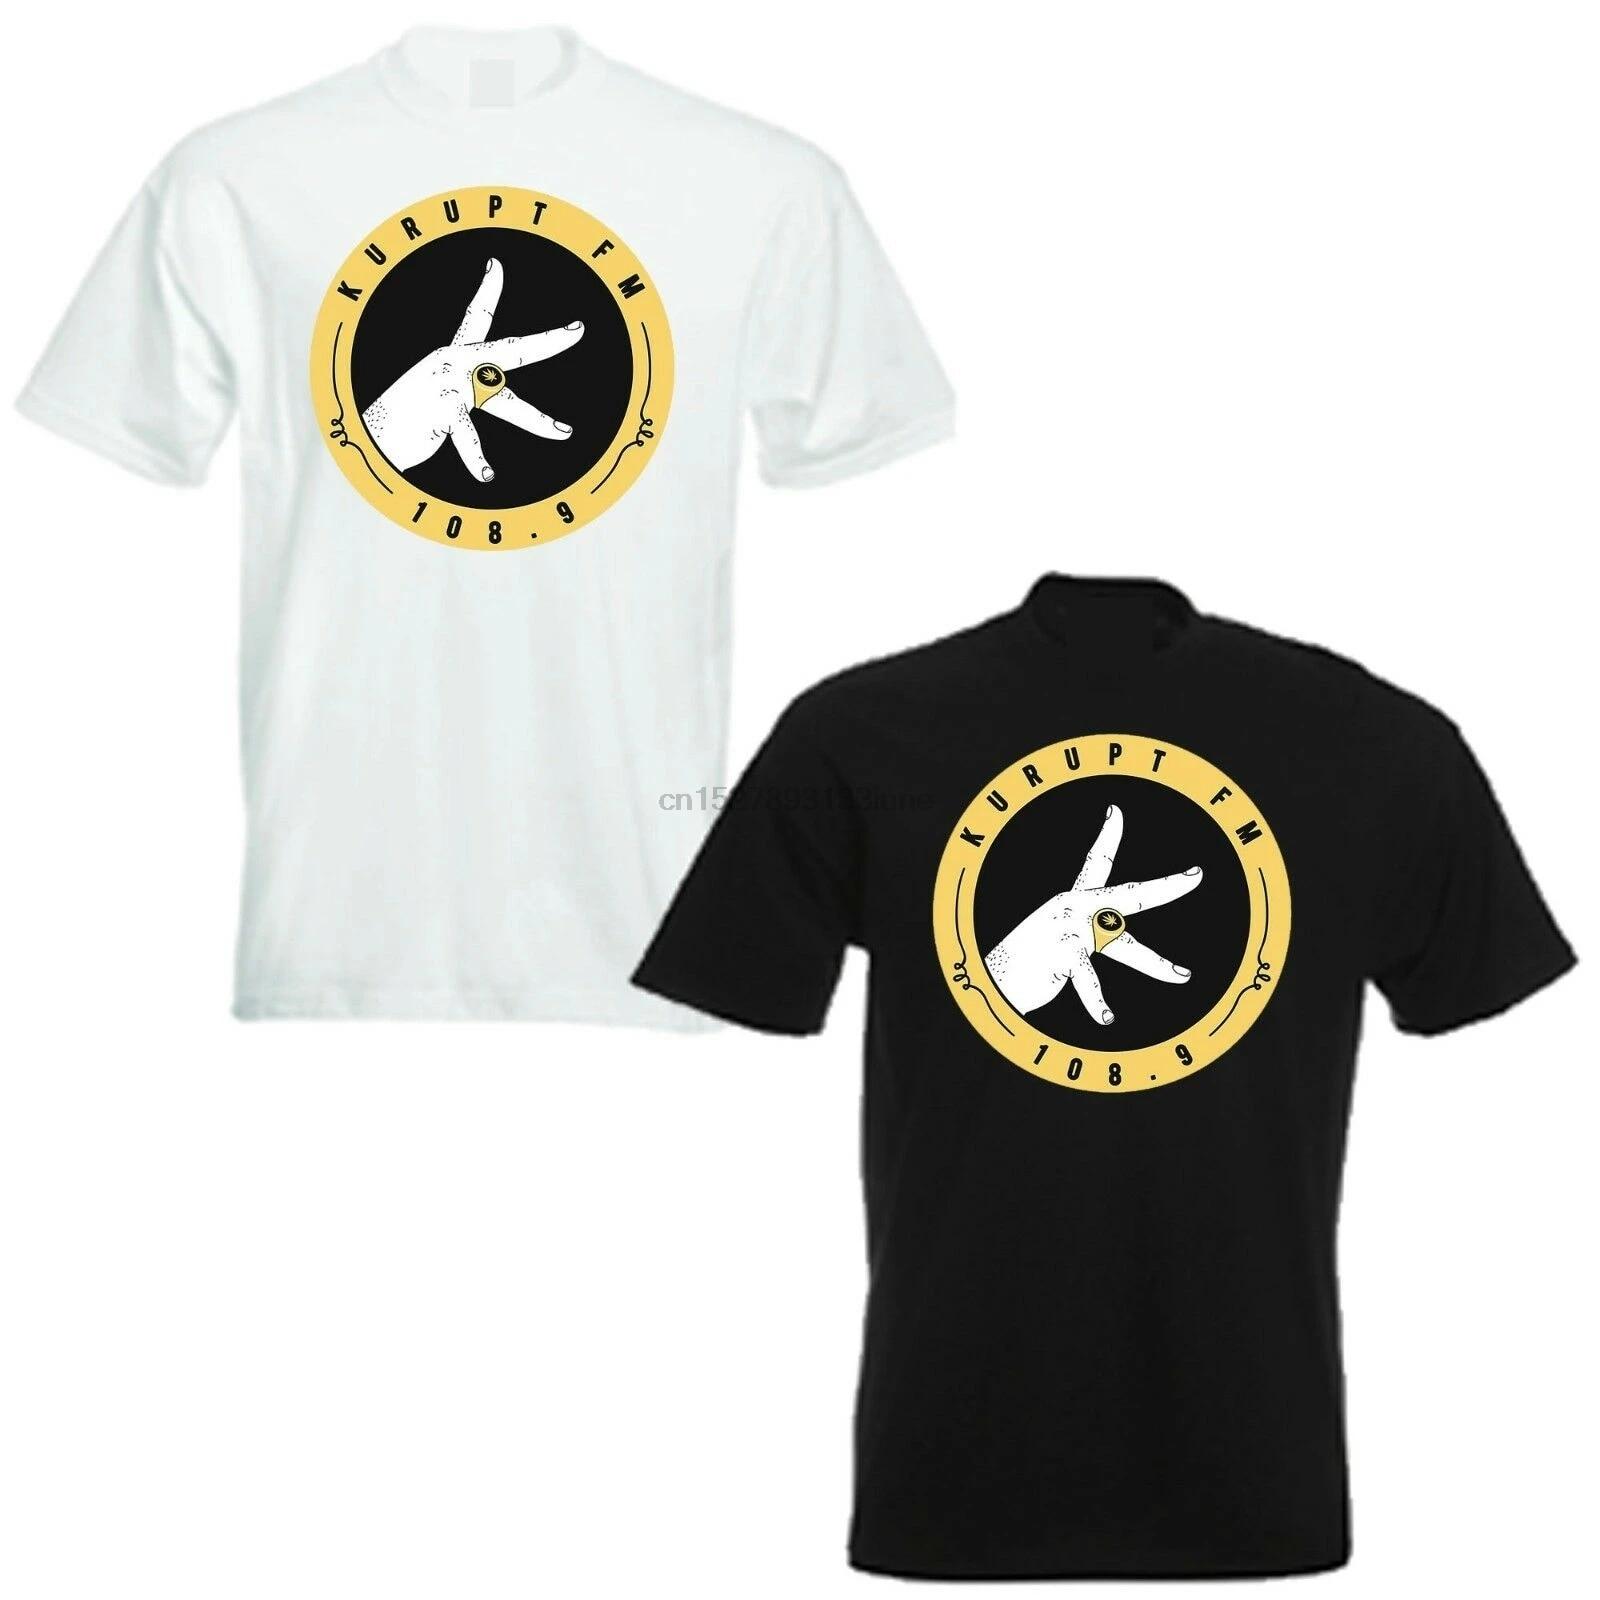 KURUPT FM Hommes T Shirt Tee LES GENS NE Drôle DJ rien radio pirate Vinyle